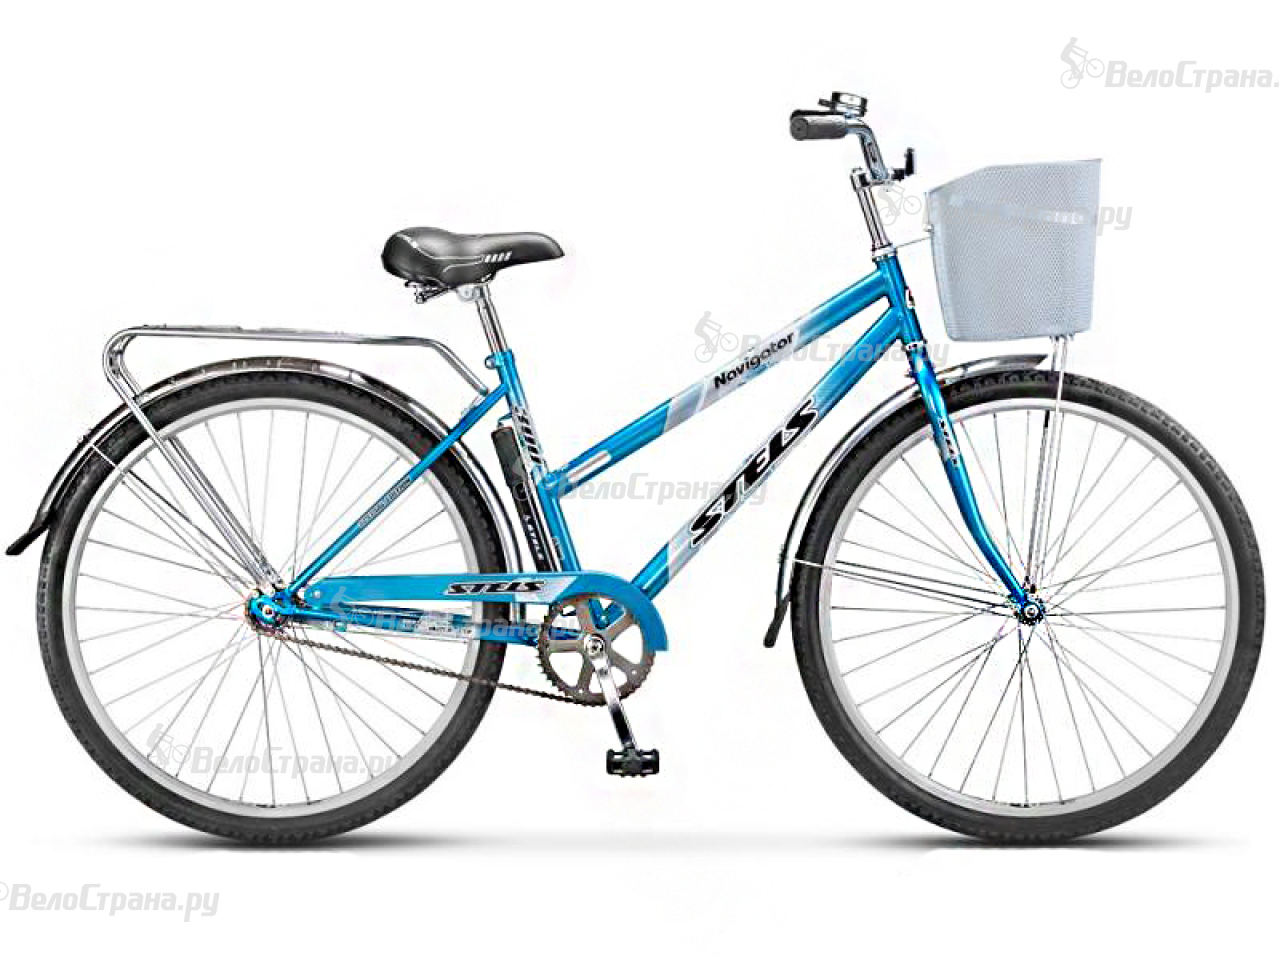 Велосипед Stels Navigator 350 Lady (2013) велосипед stels navigator 150 3sp lady 2016